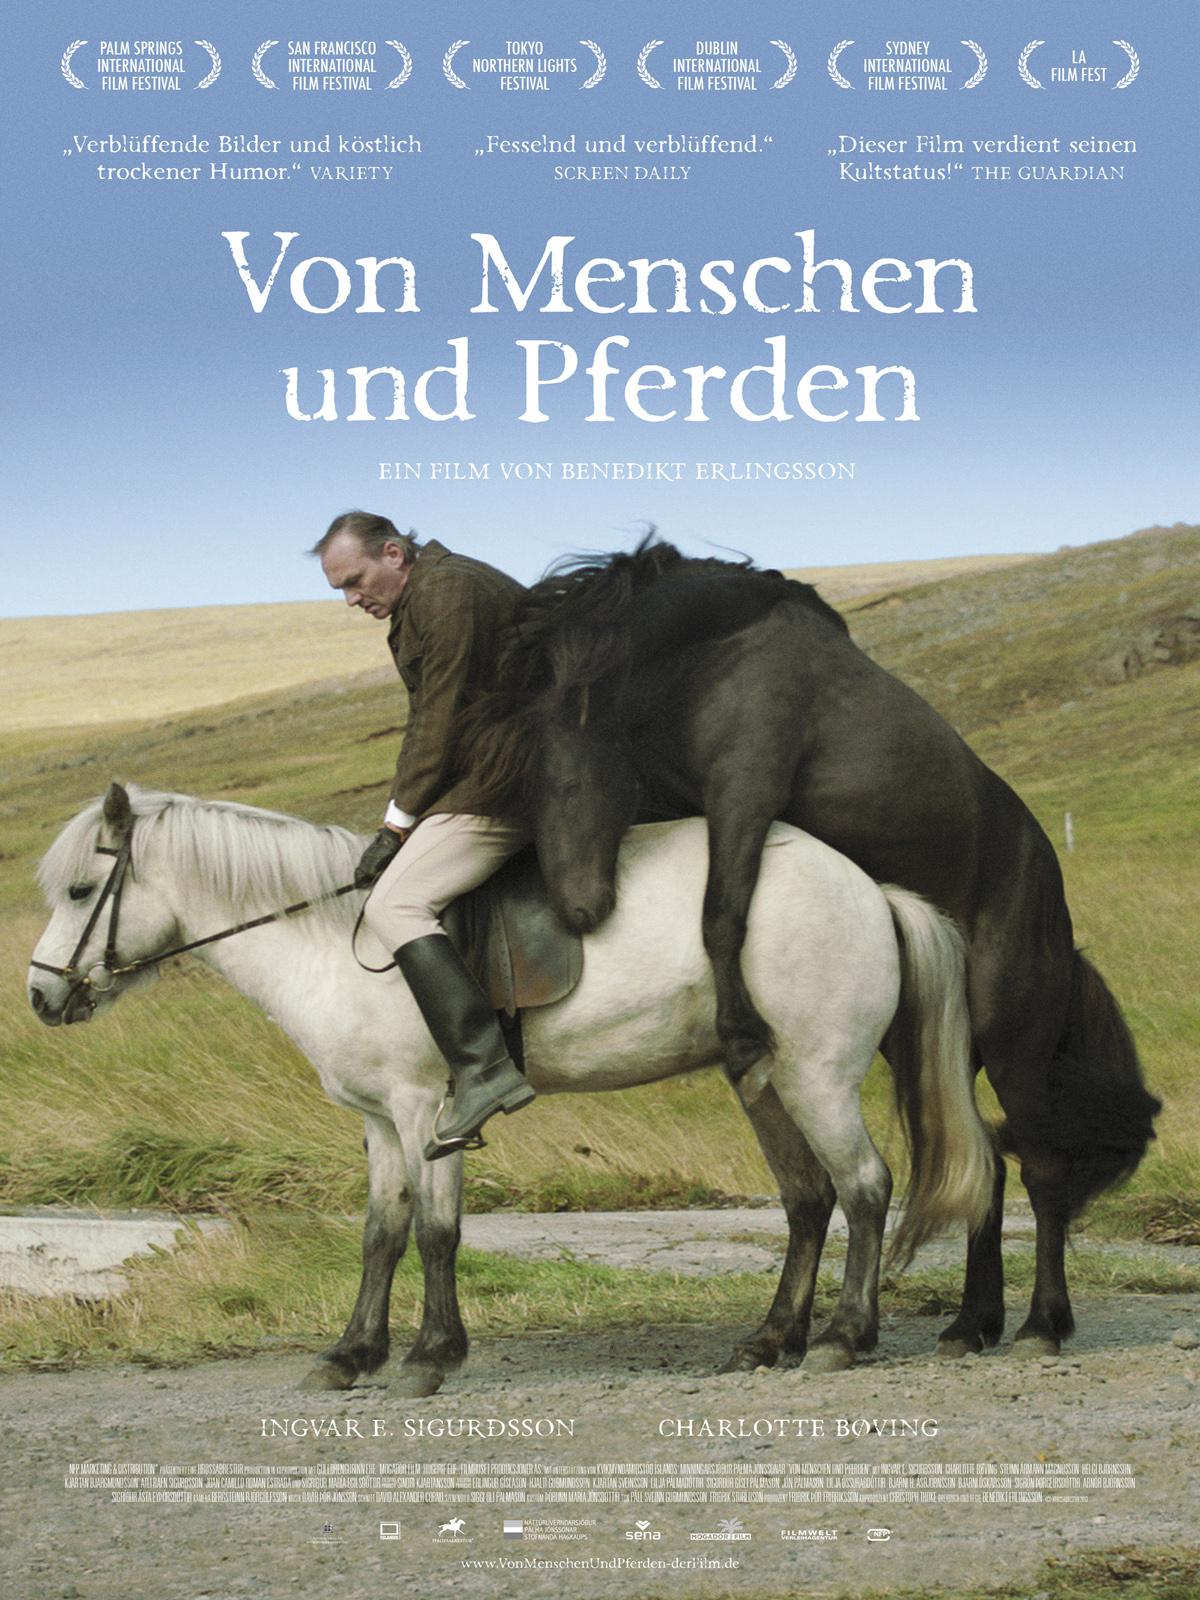 Fiken pferde Freies Tiergeschlecht,